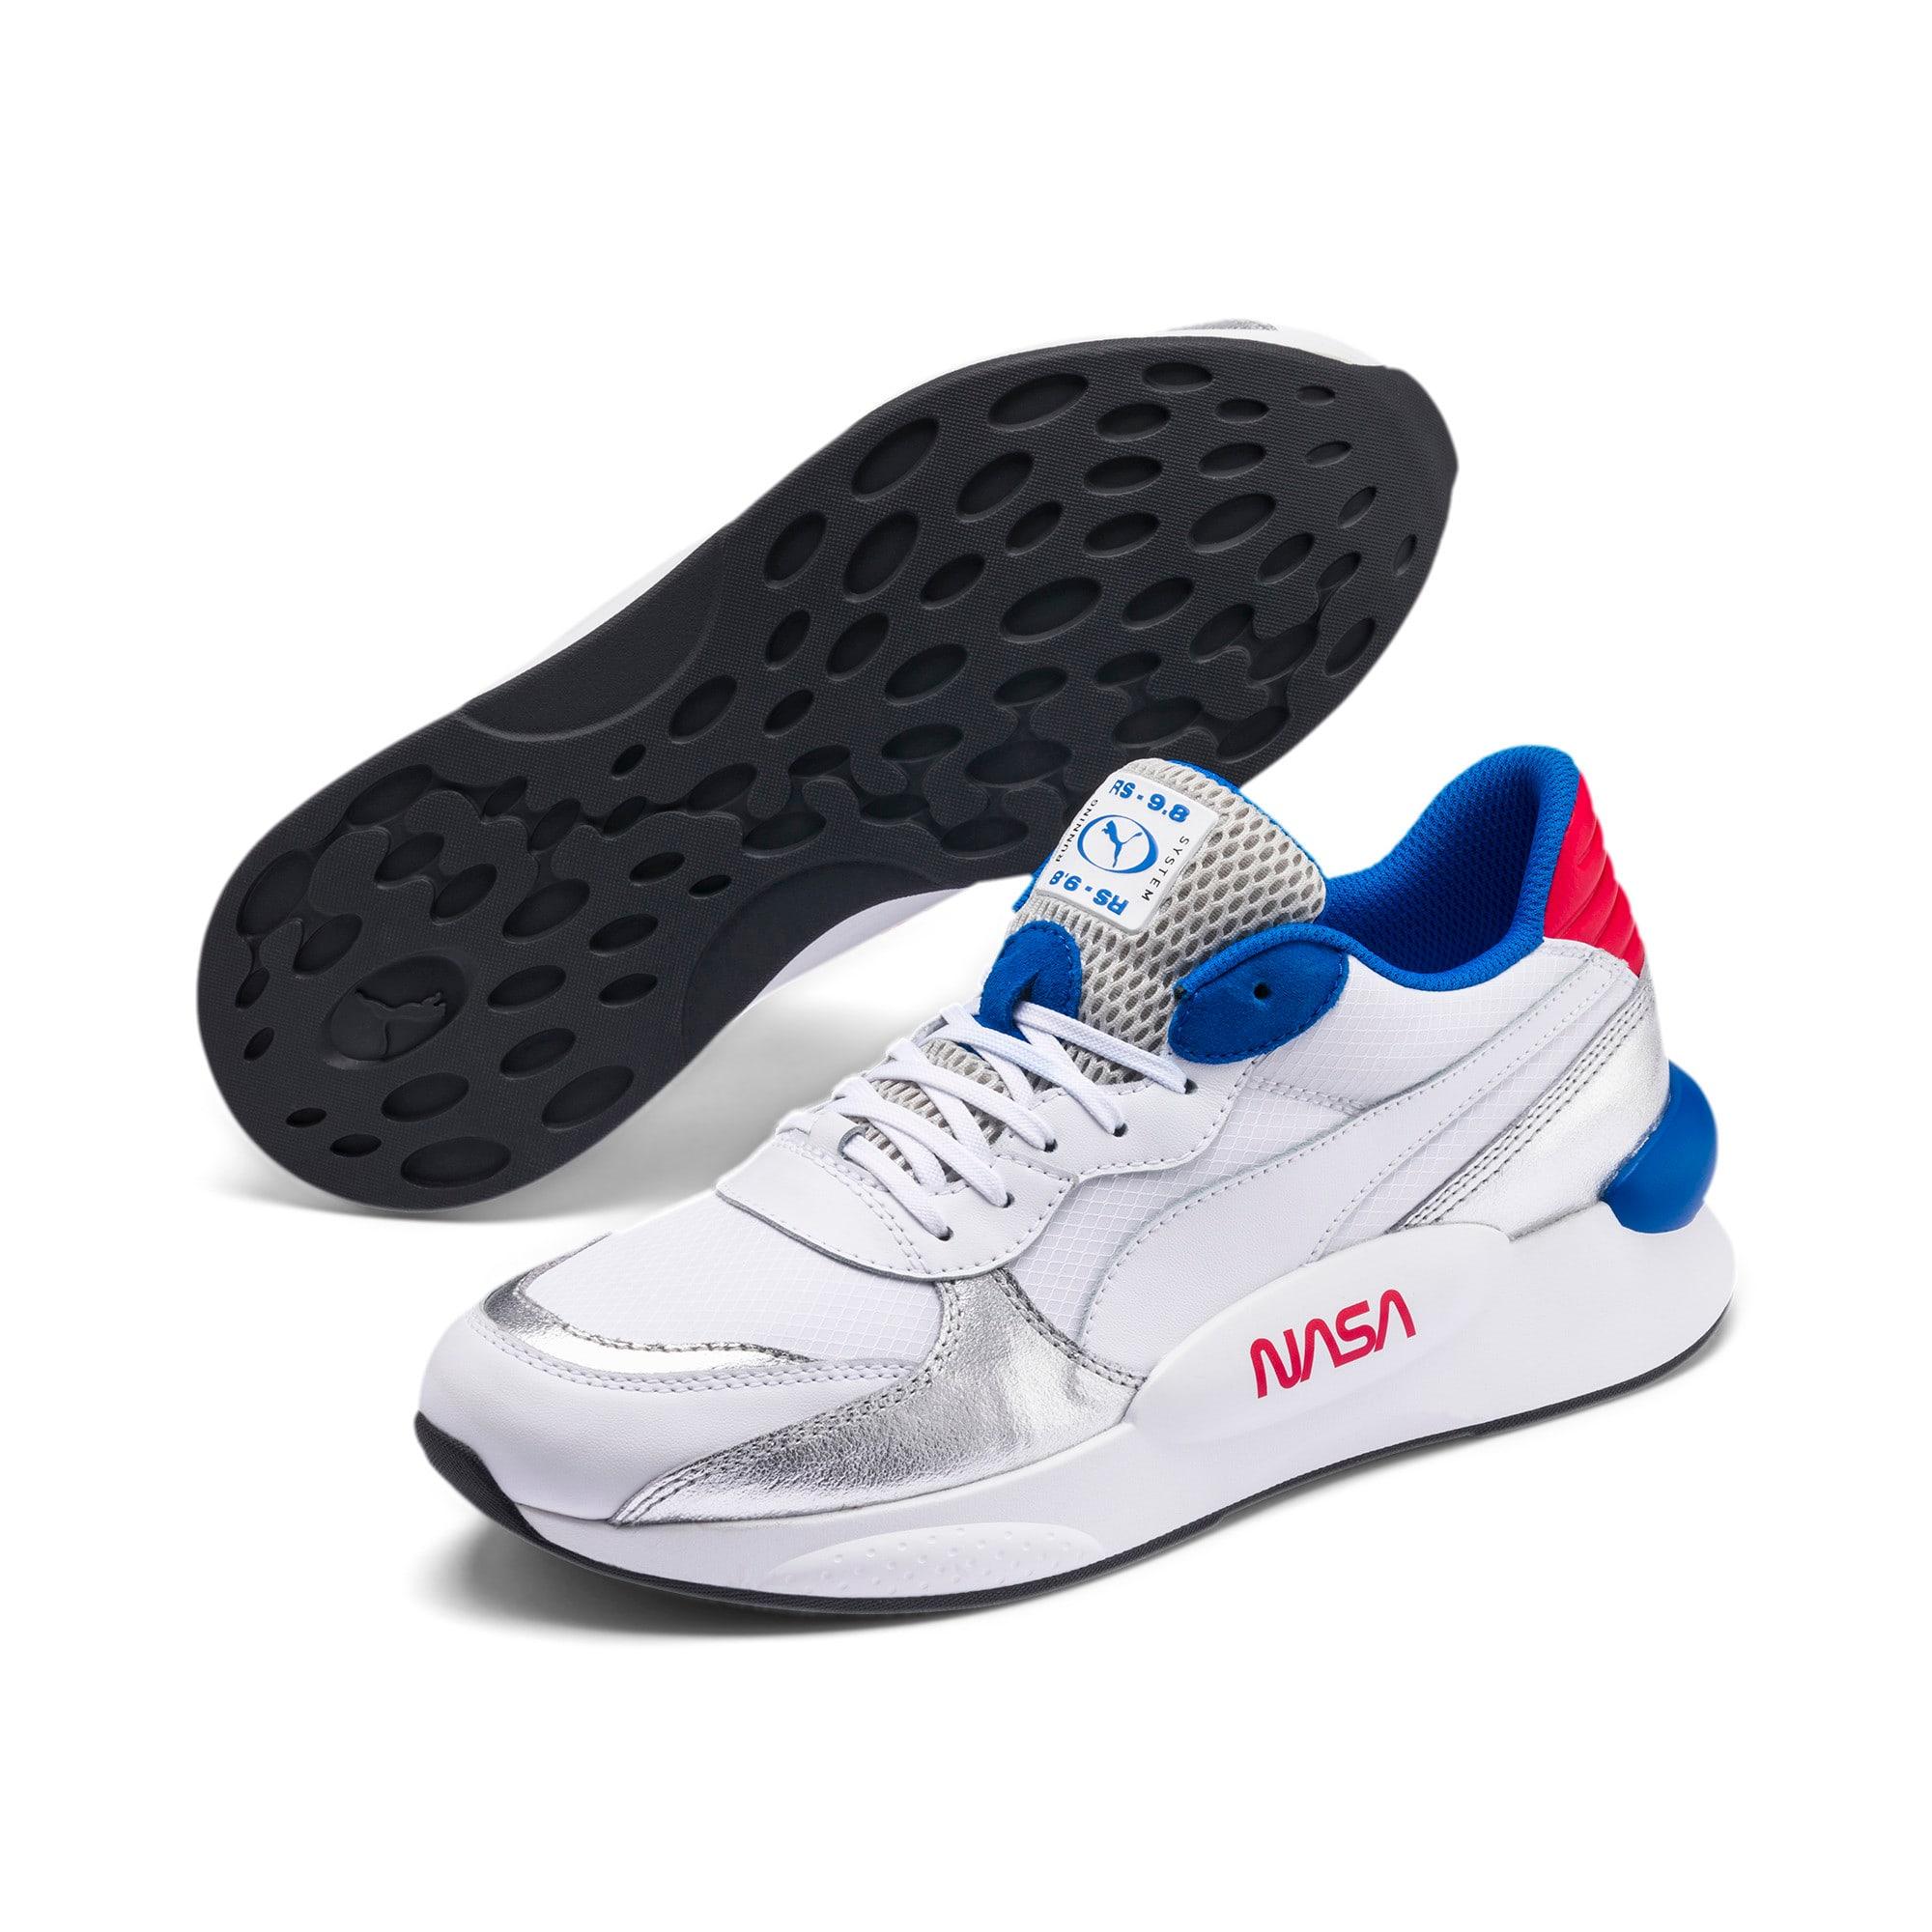 Thumbnail 2 of RS 9.8 Space Agency Sneakers, Puma White-Puma Silver, medium